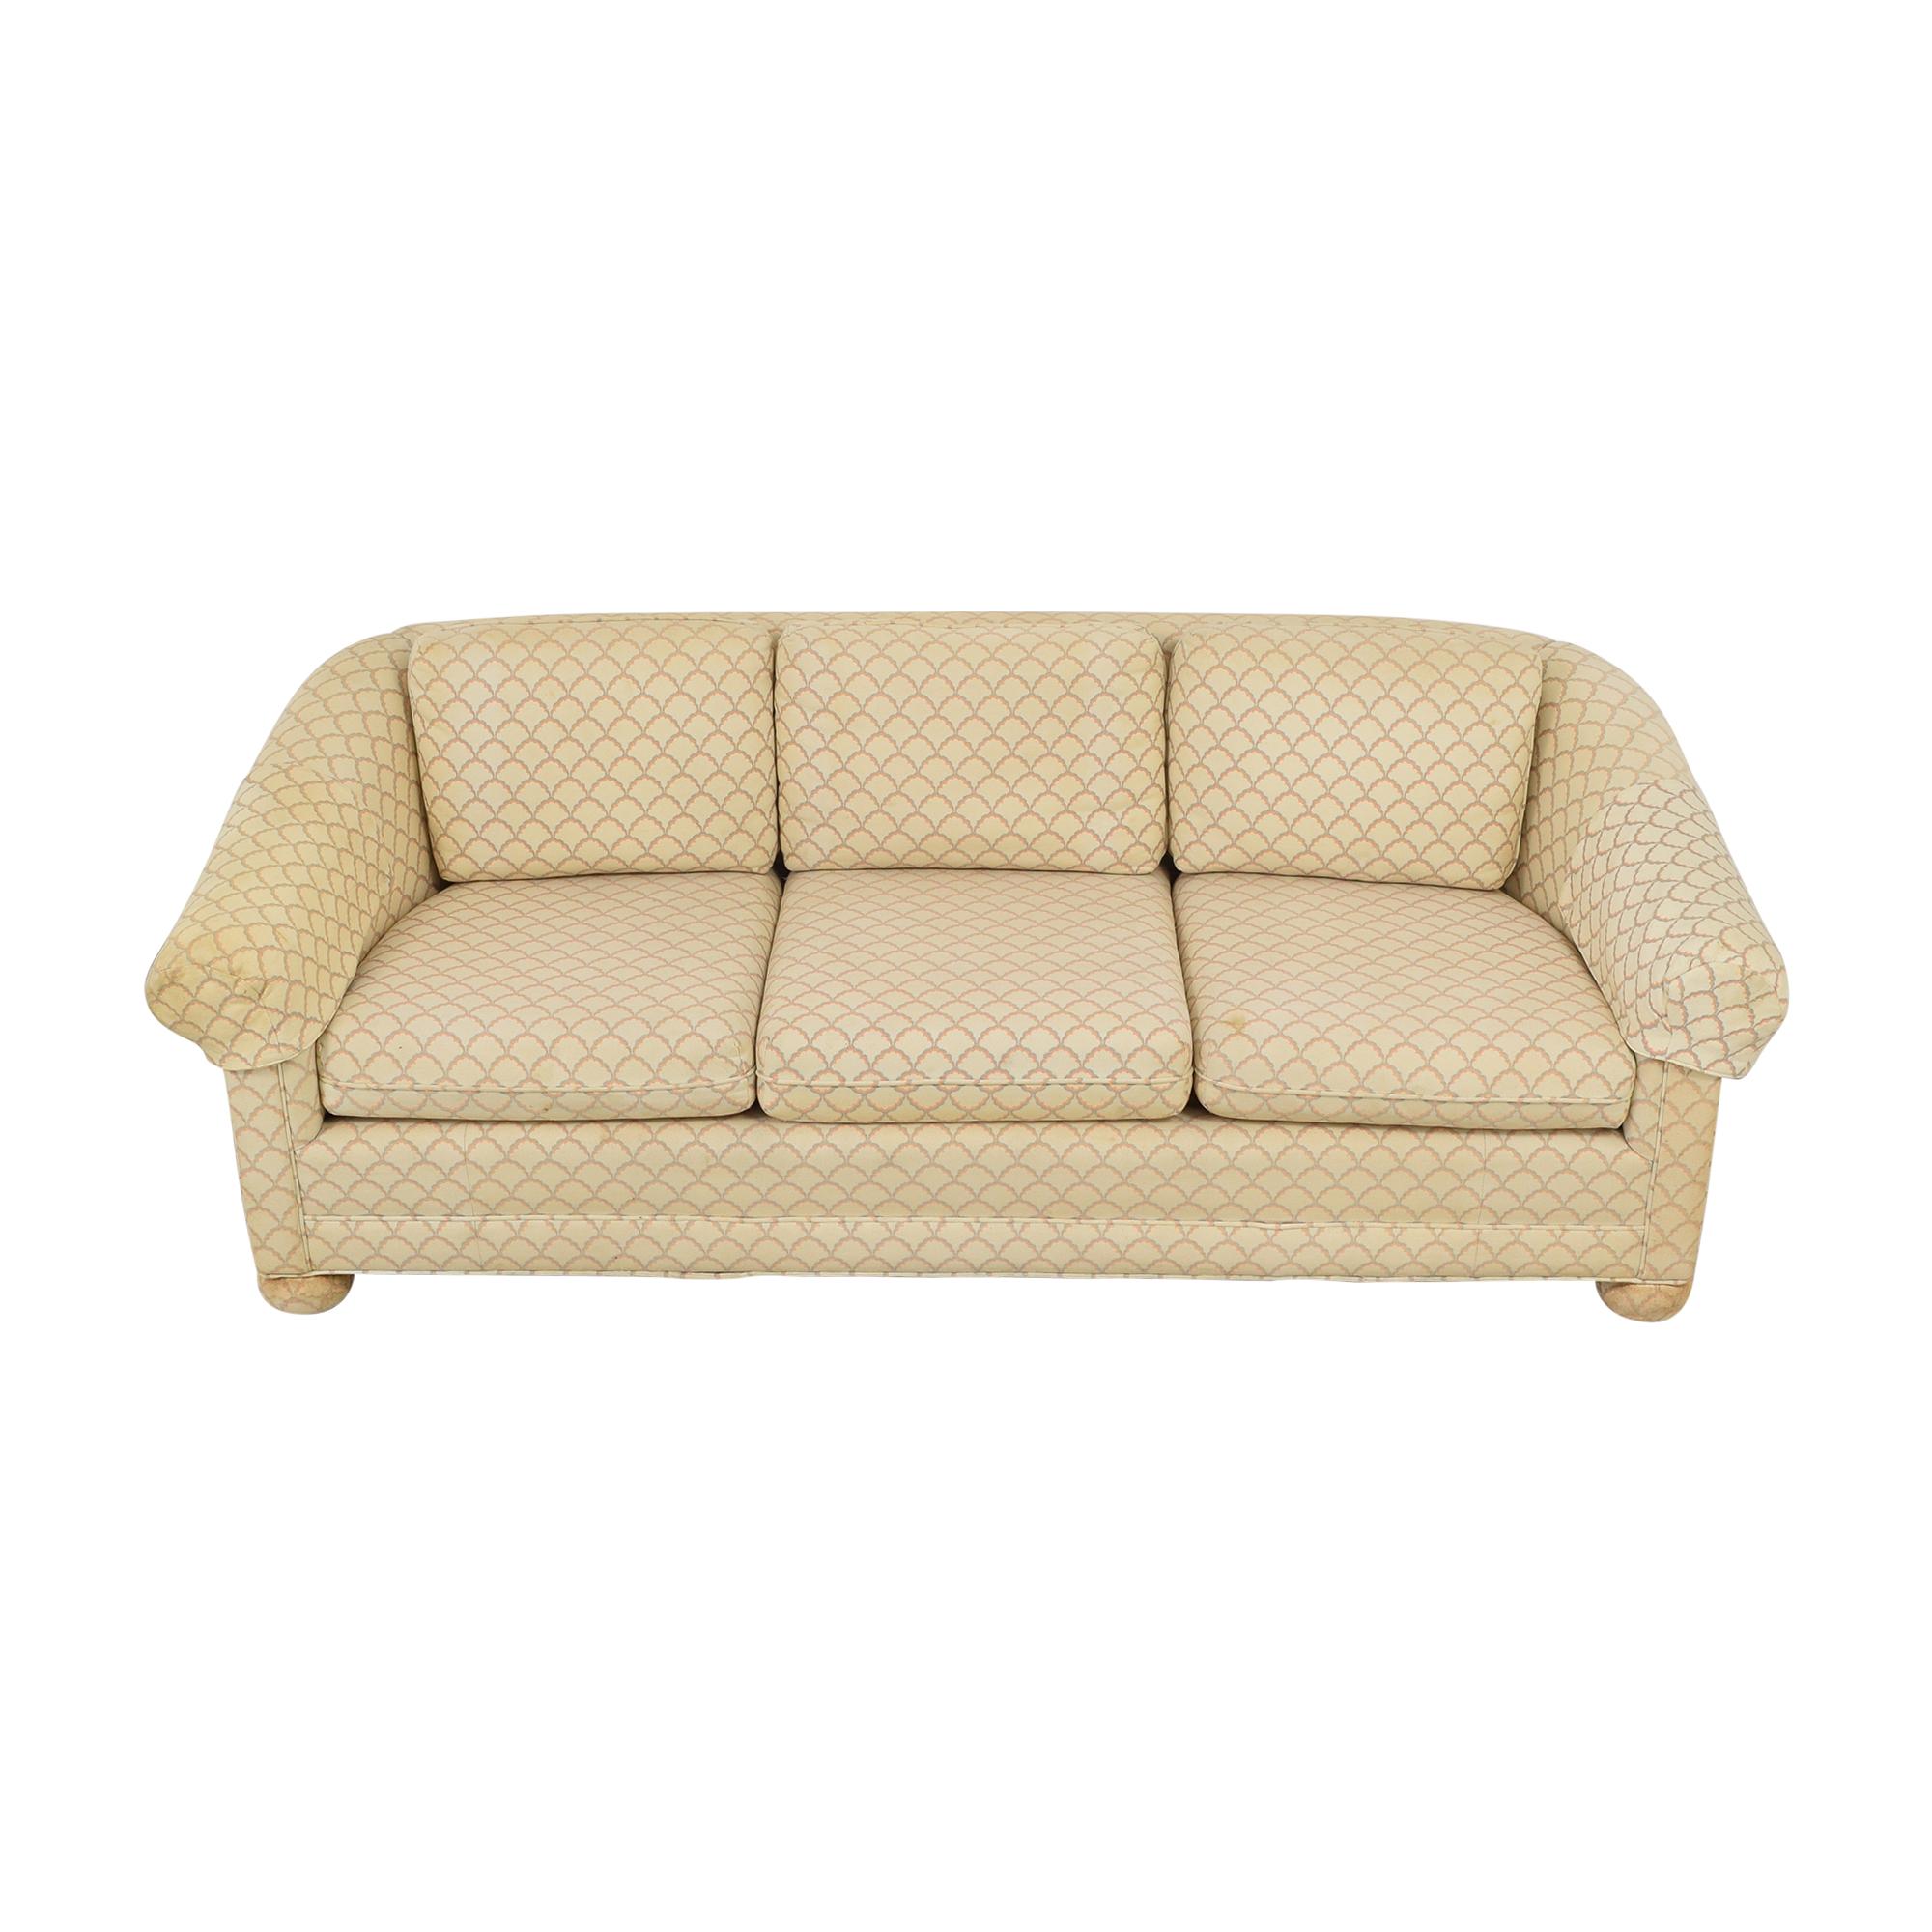 Three Seat Patterned Sofa coupon